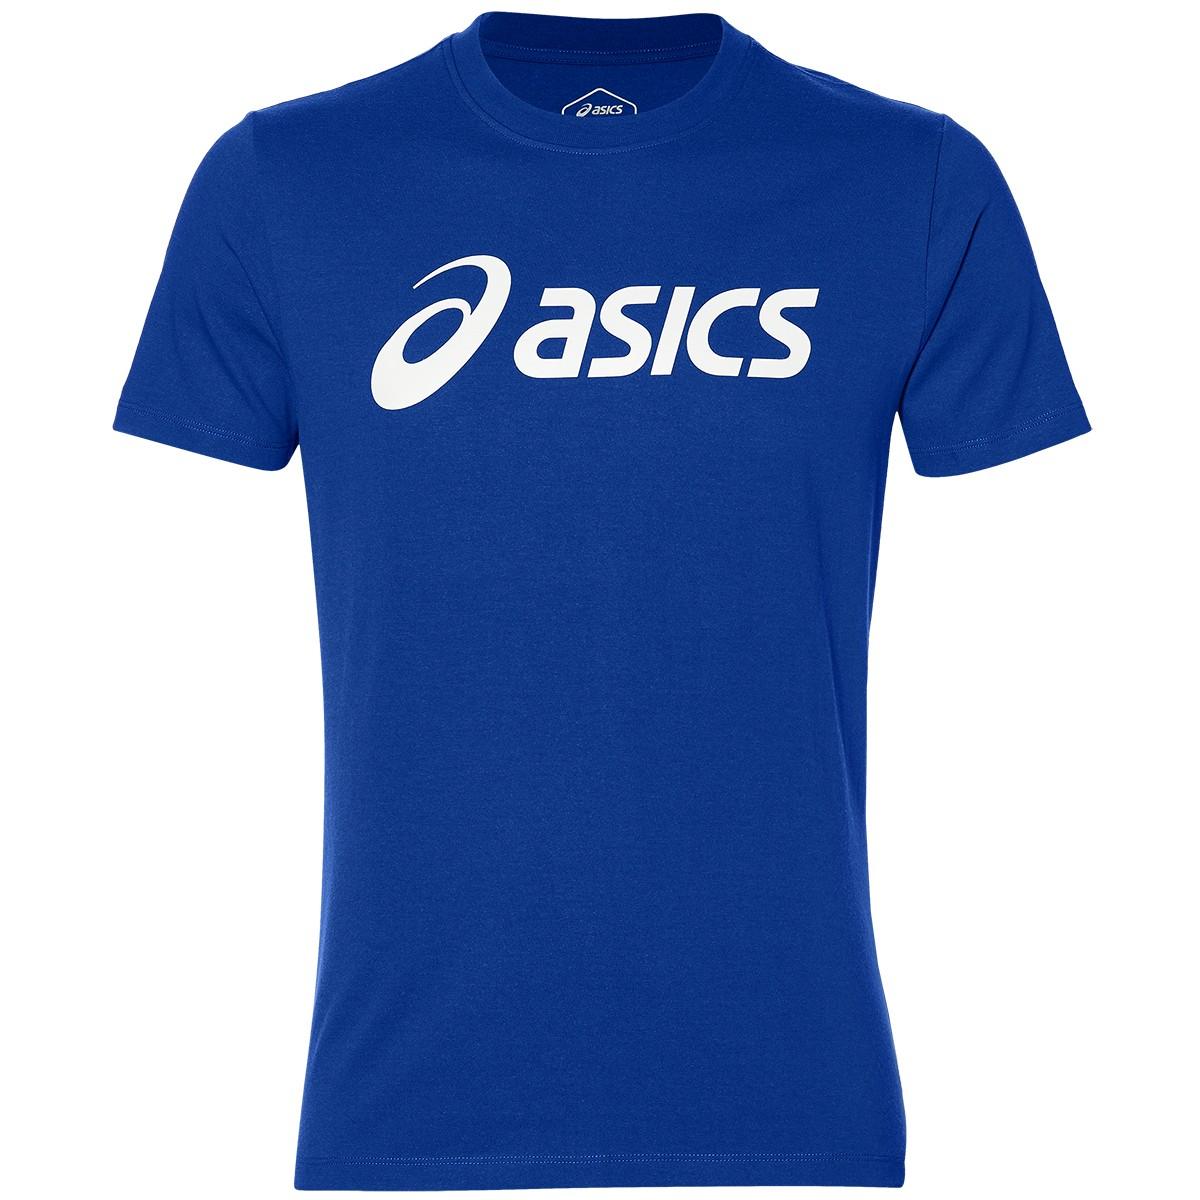 ASICS BIG LOGO T-SHIRT - ASICS - Men's - Clothing | Tennispro